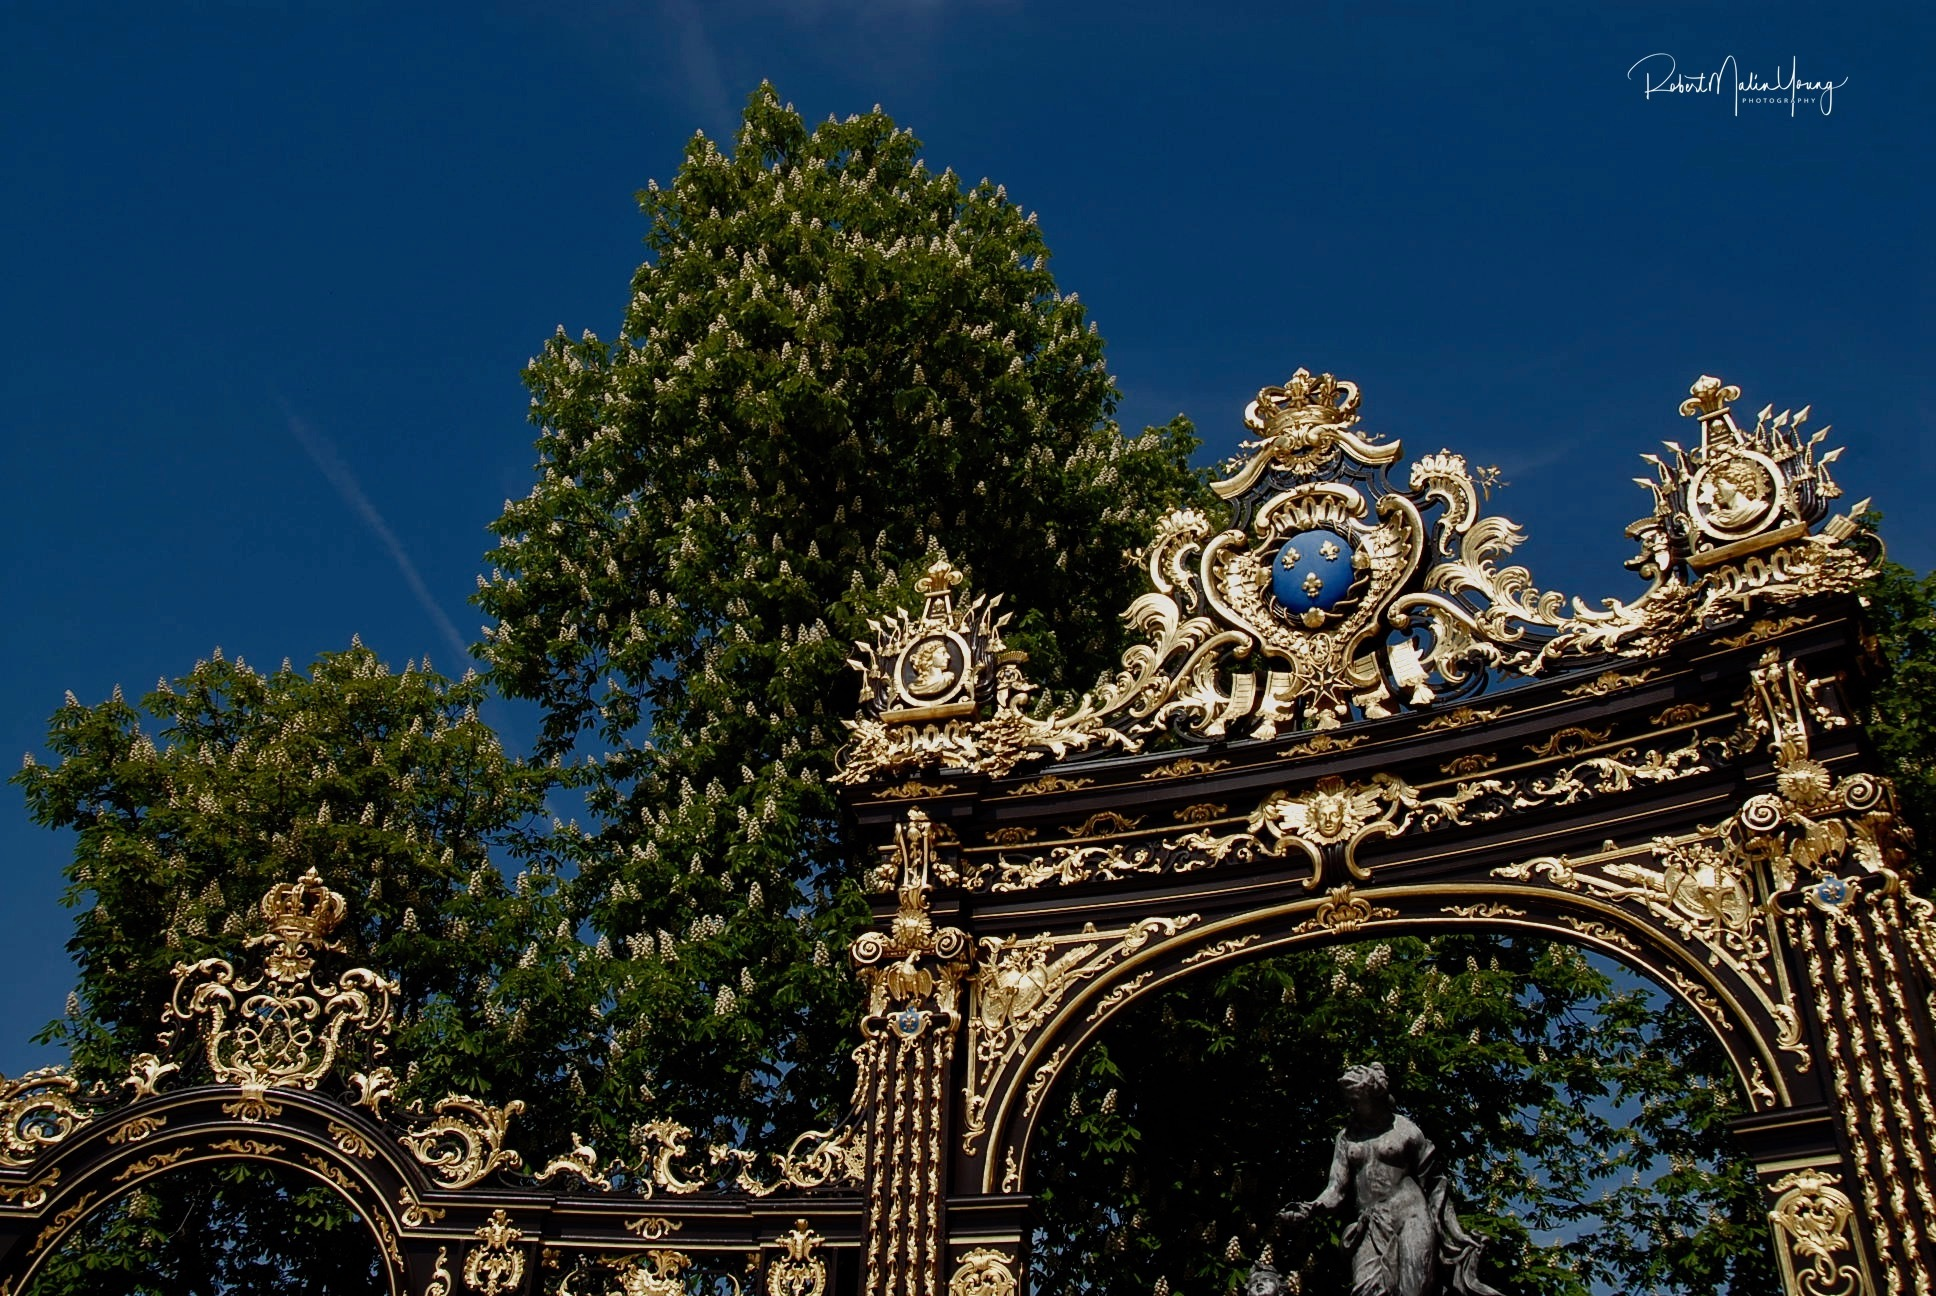 La Belle France - Nancy - 2018 by Robert Malin Young